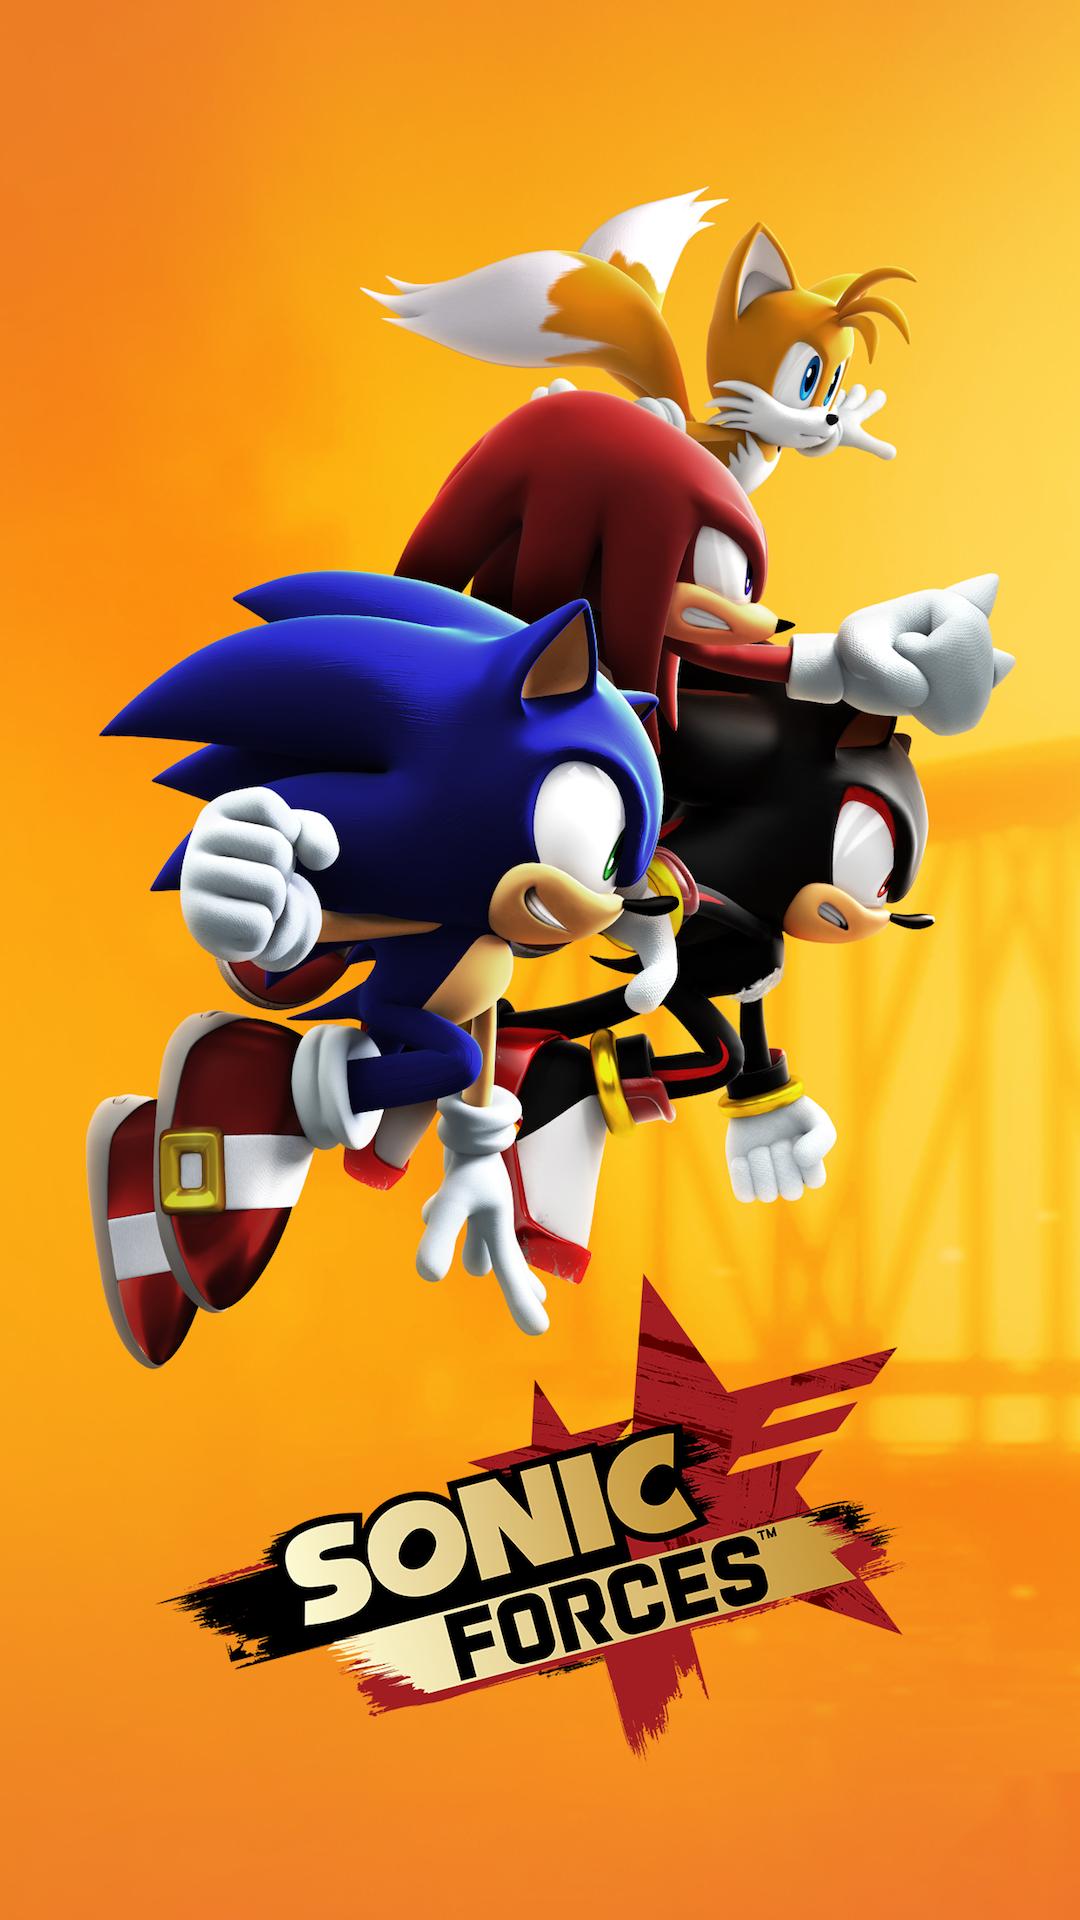 Sonic Forces: Amazon.com.br: Amazon Appstore